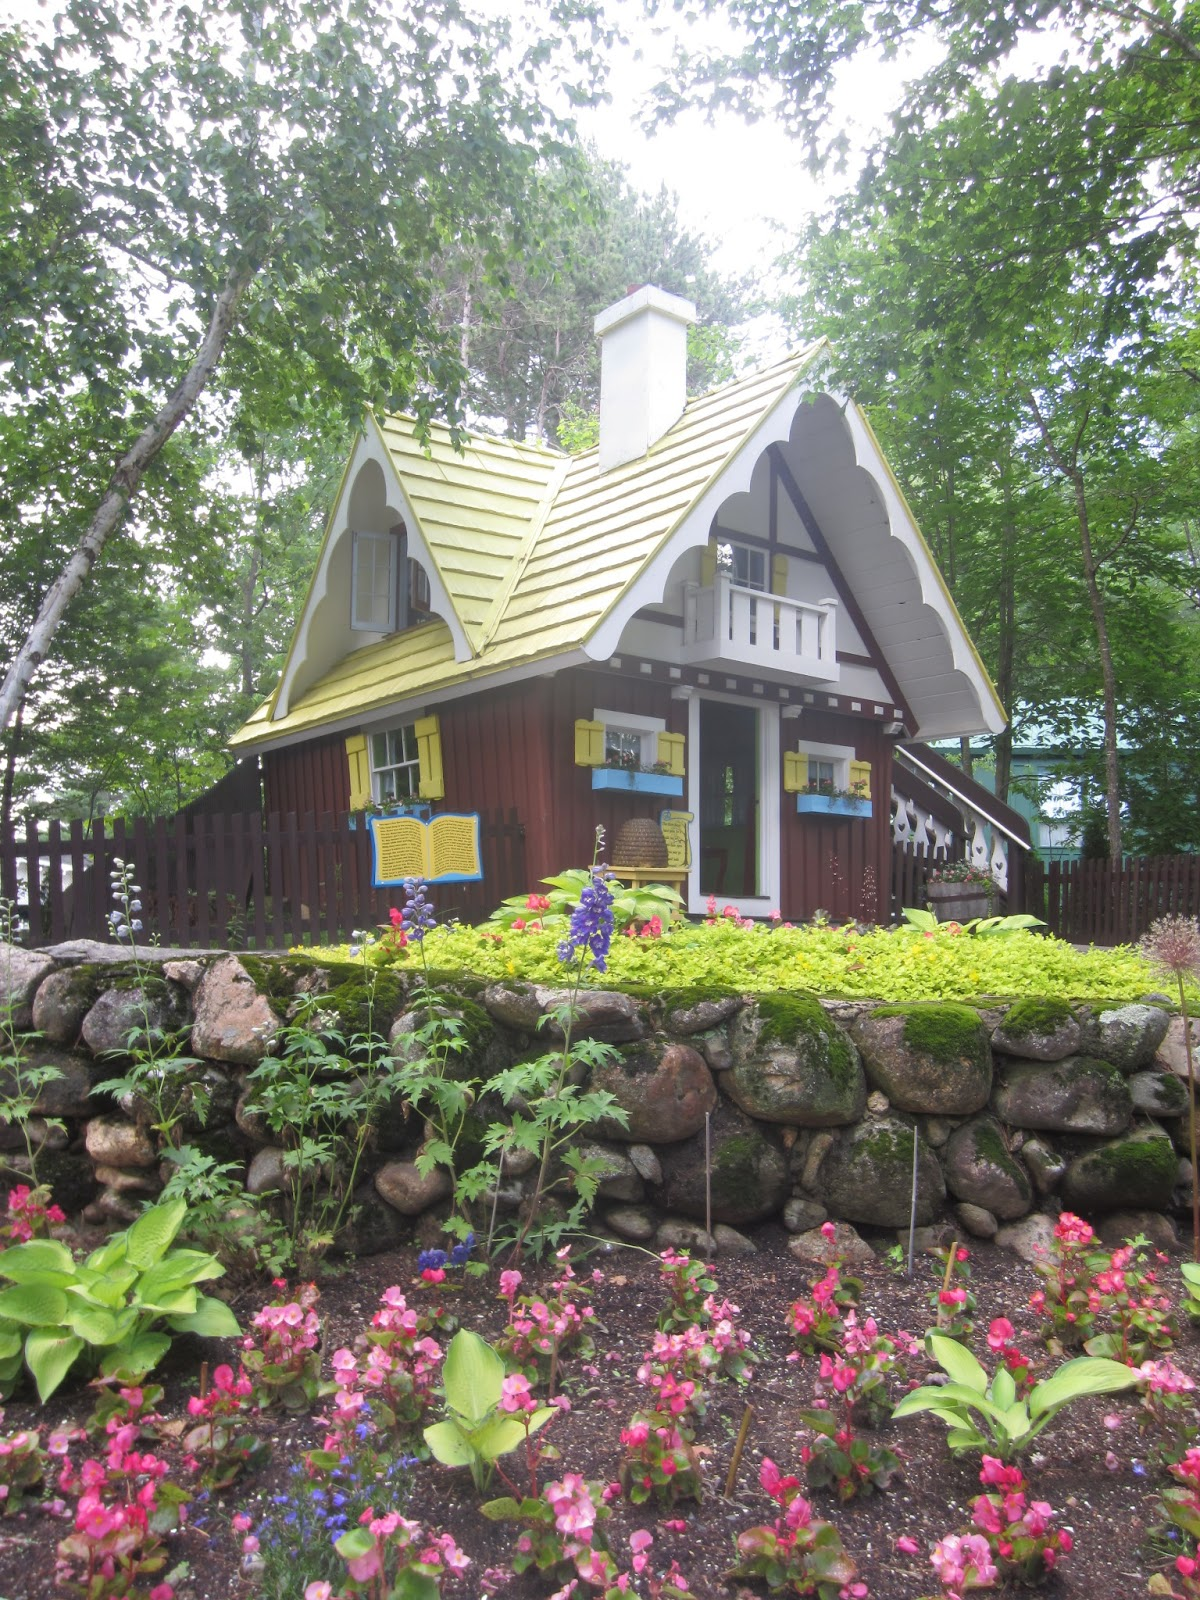 Uncategorized Three Little Bear relaxshacks com the three little bears tiny house re creation in nh